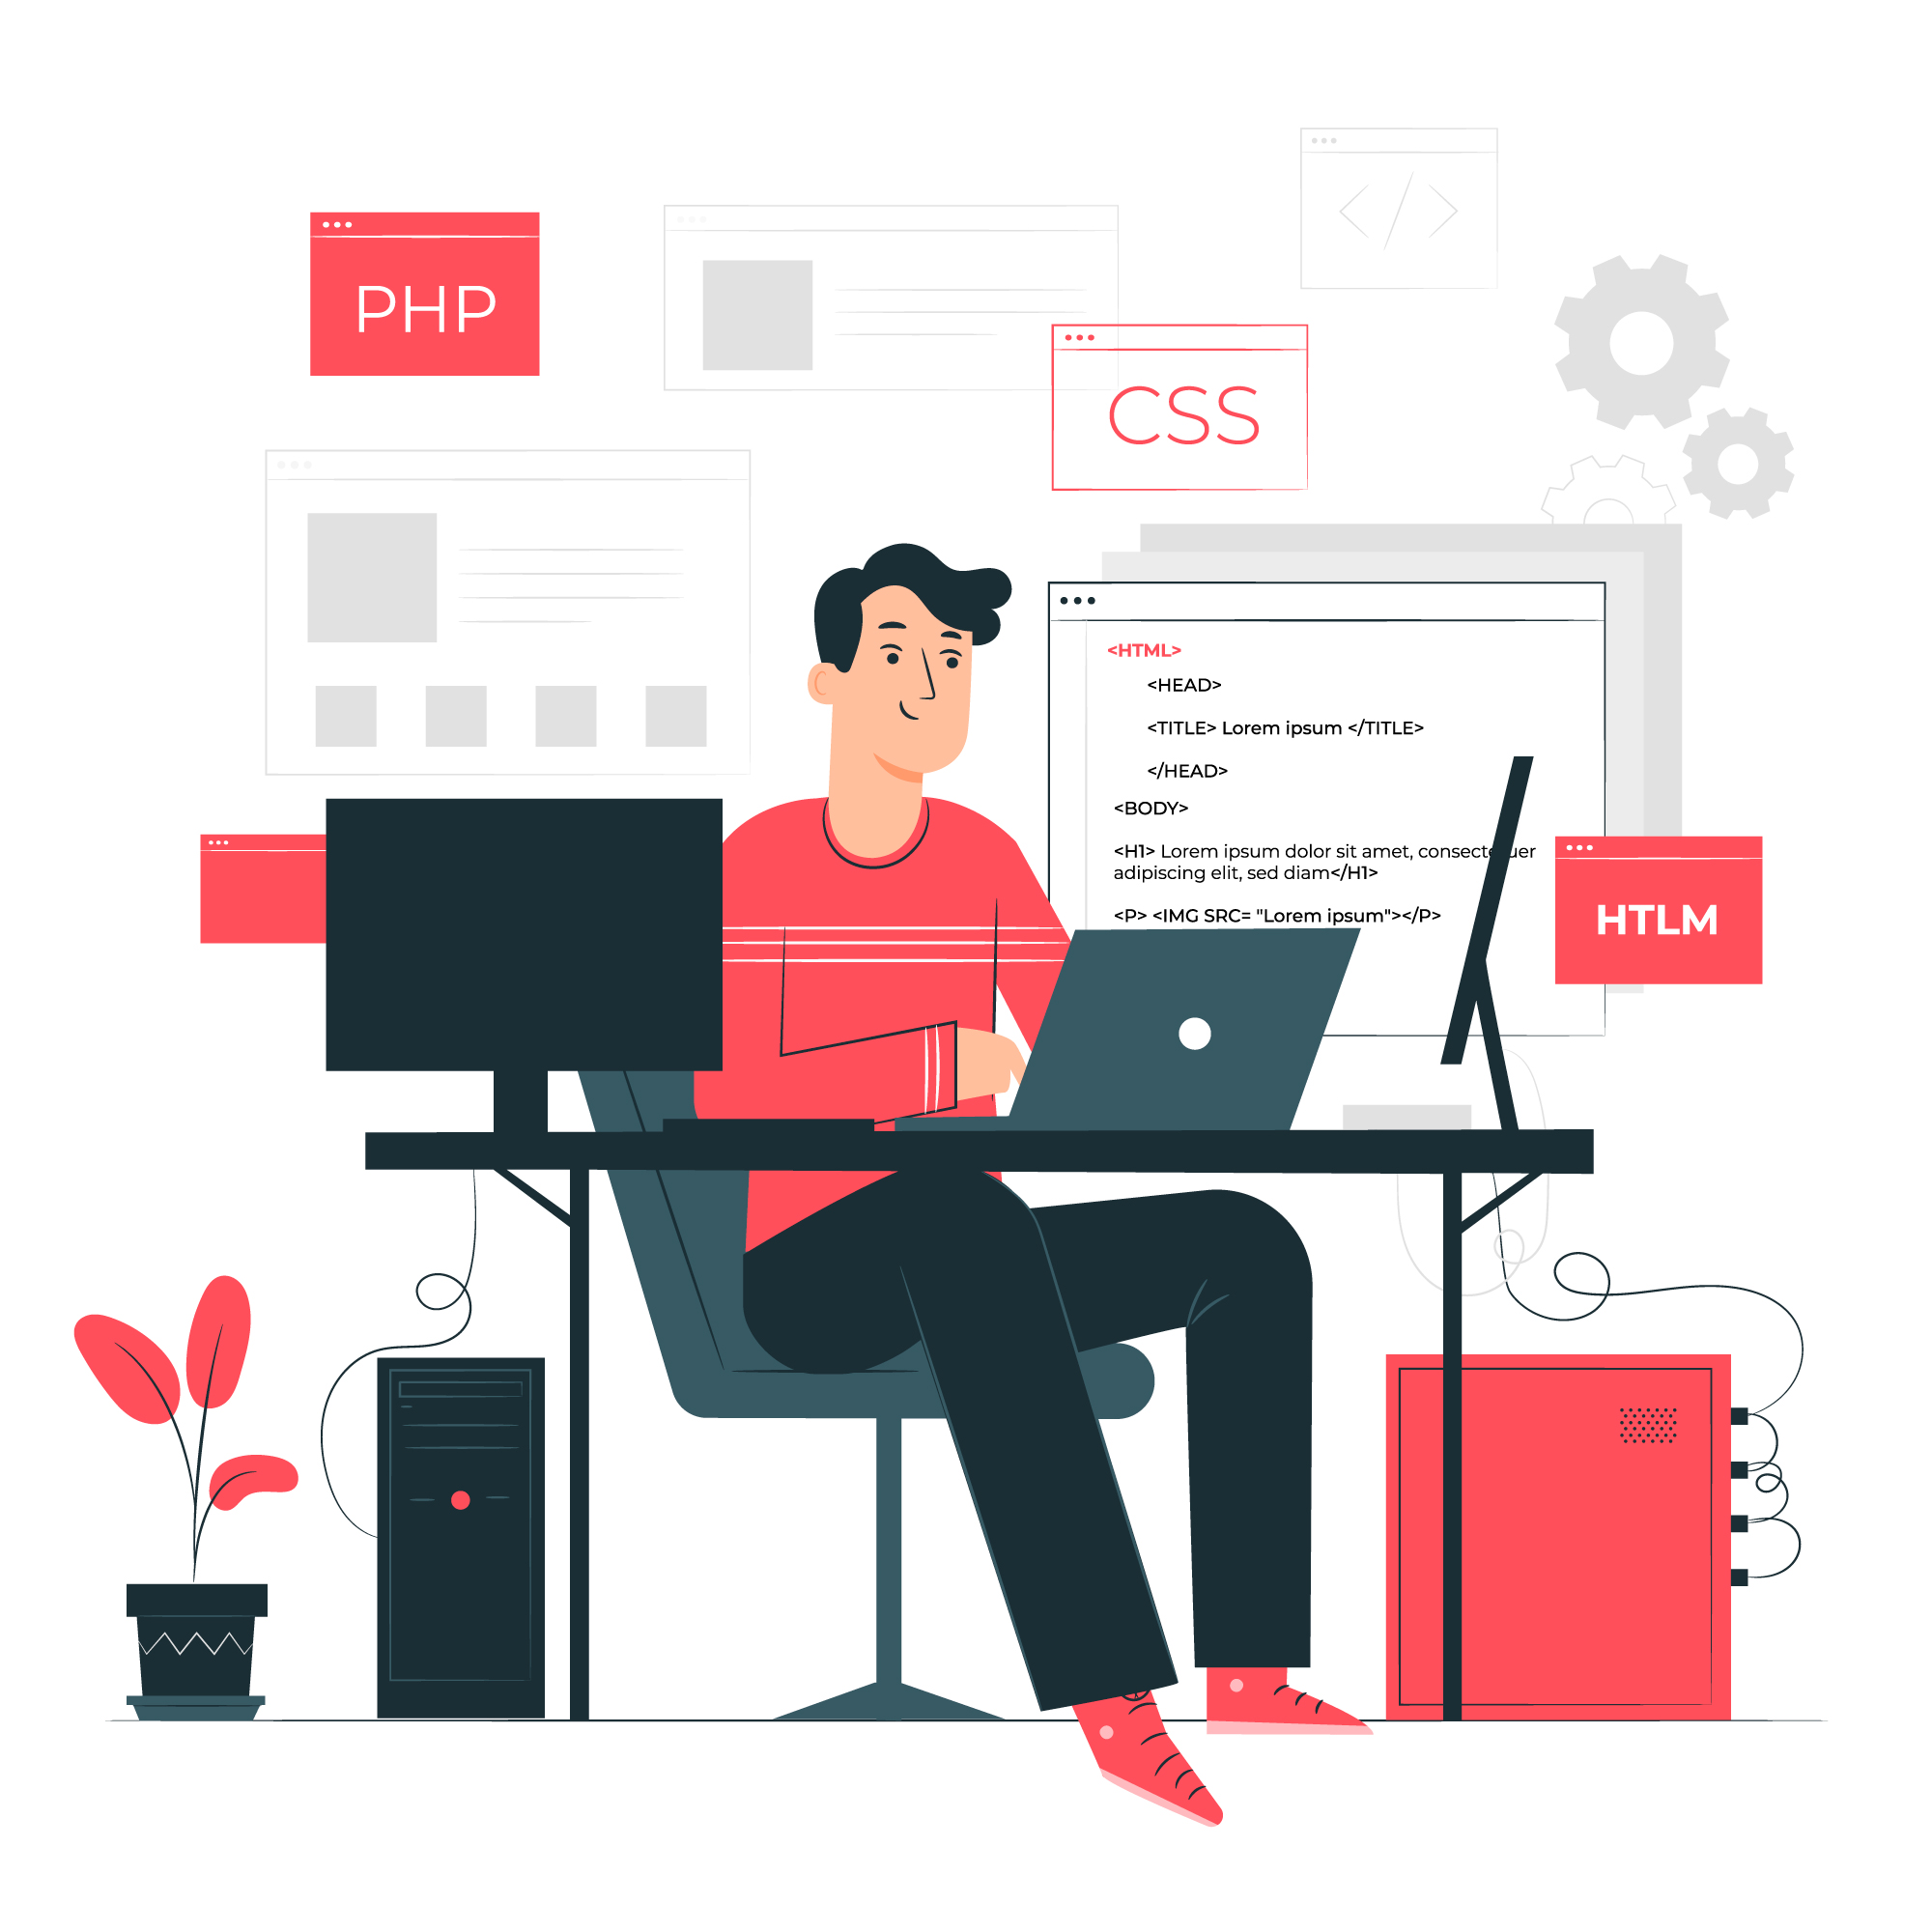 image developpeur web